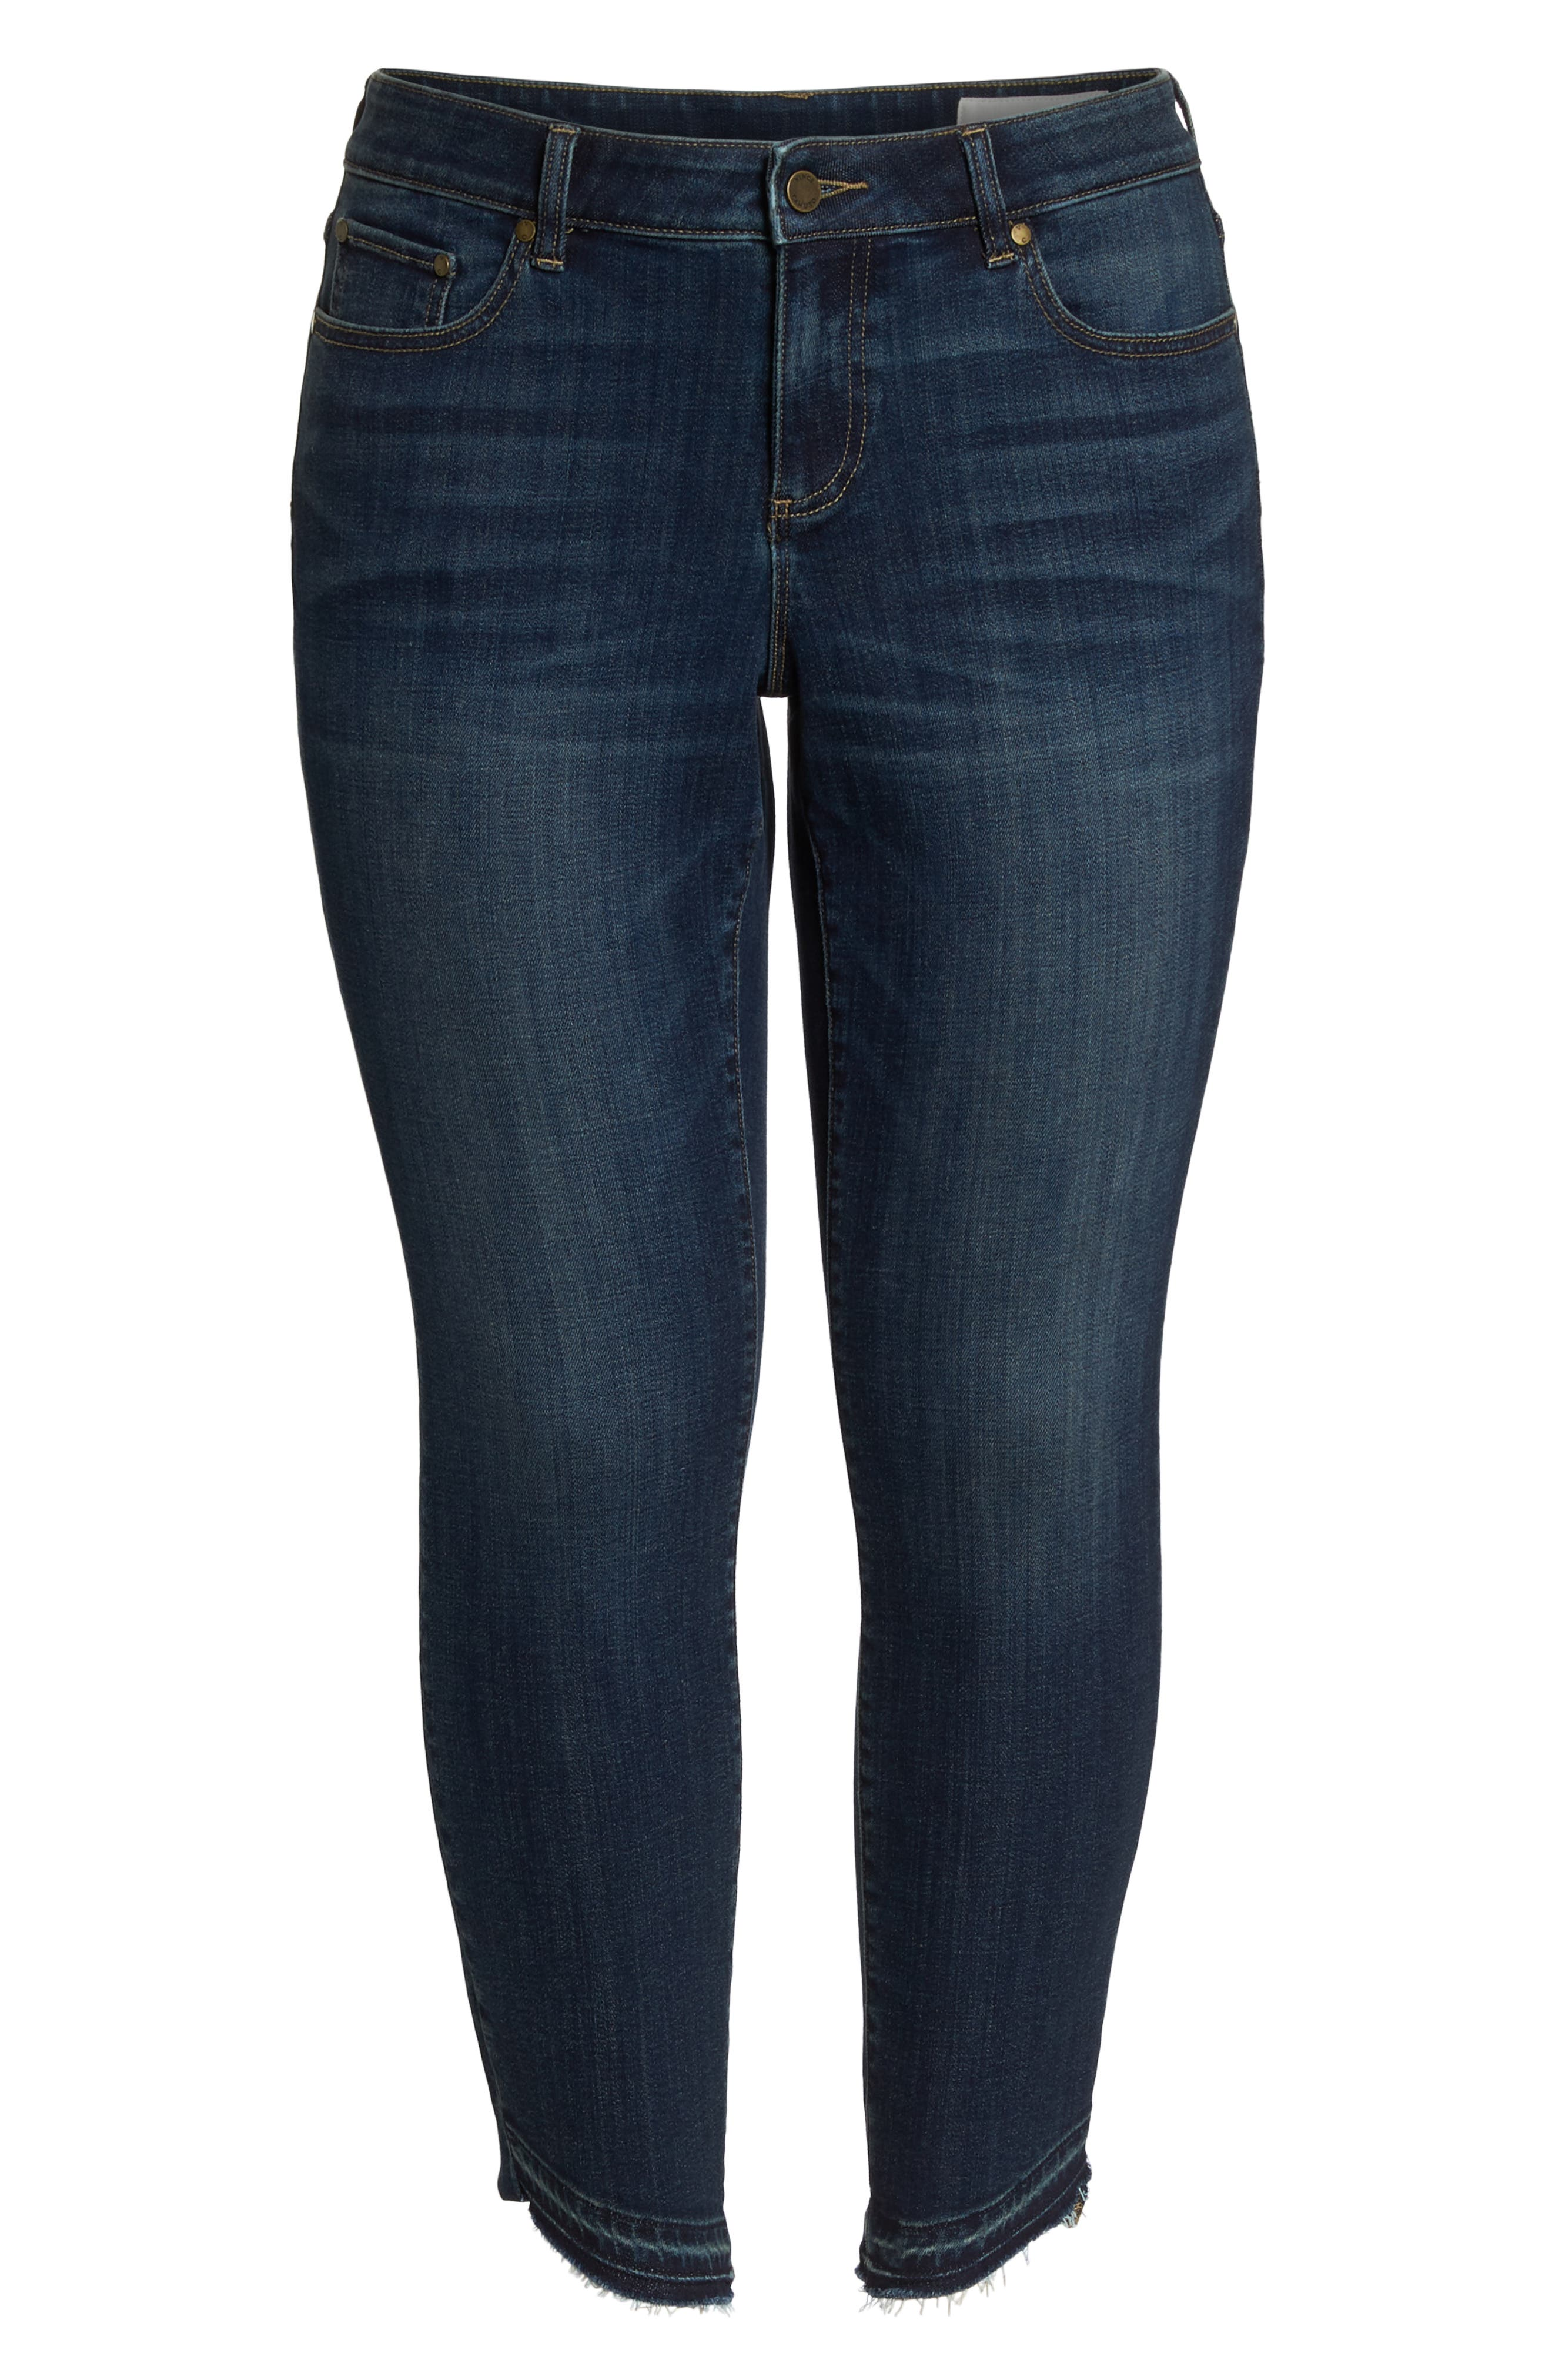 Indigo Curve Hem Skinny Jeans,                             Alternate thumbnail 7, color,                             DARK AUTHENTIC